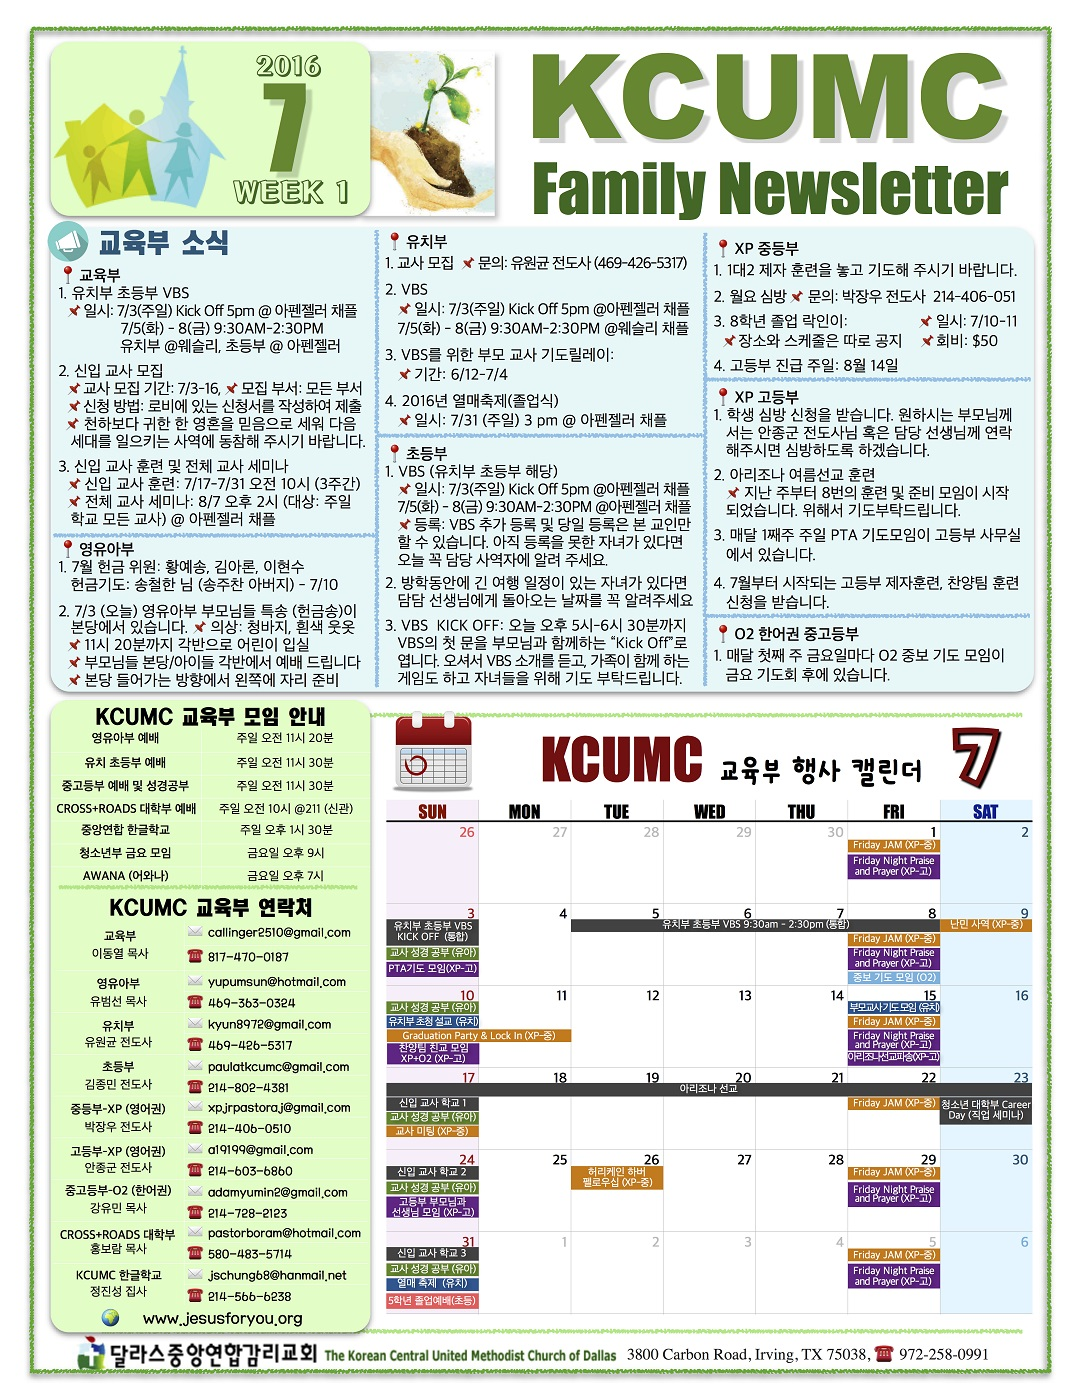 Newsletter 7월 1주 1